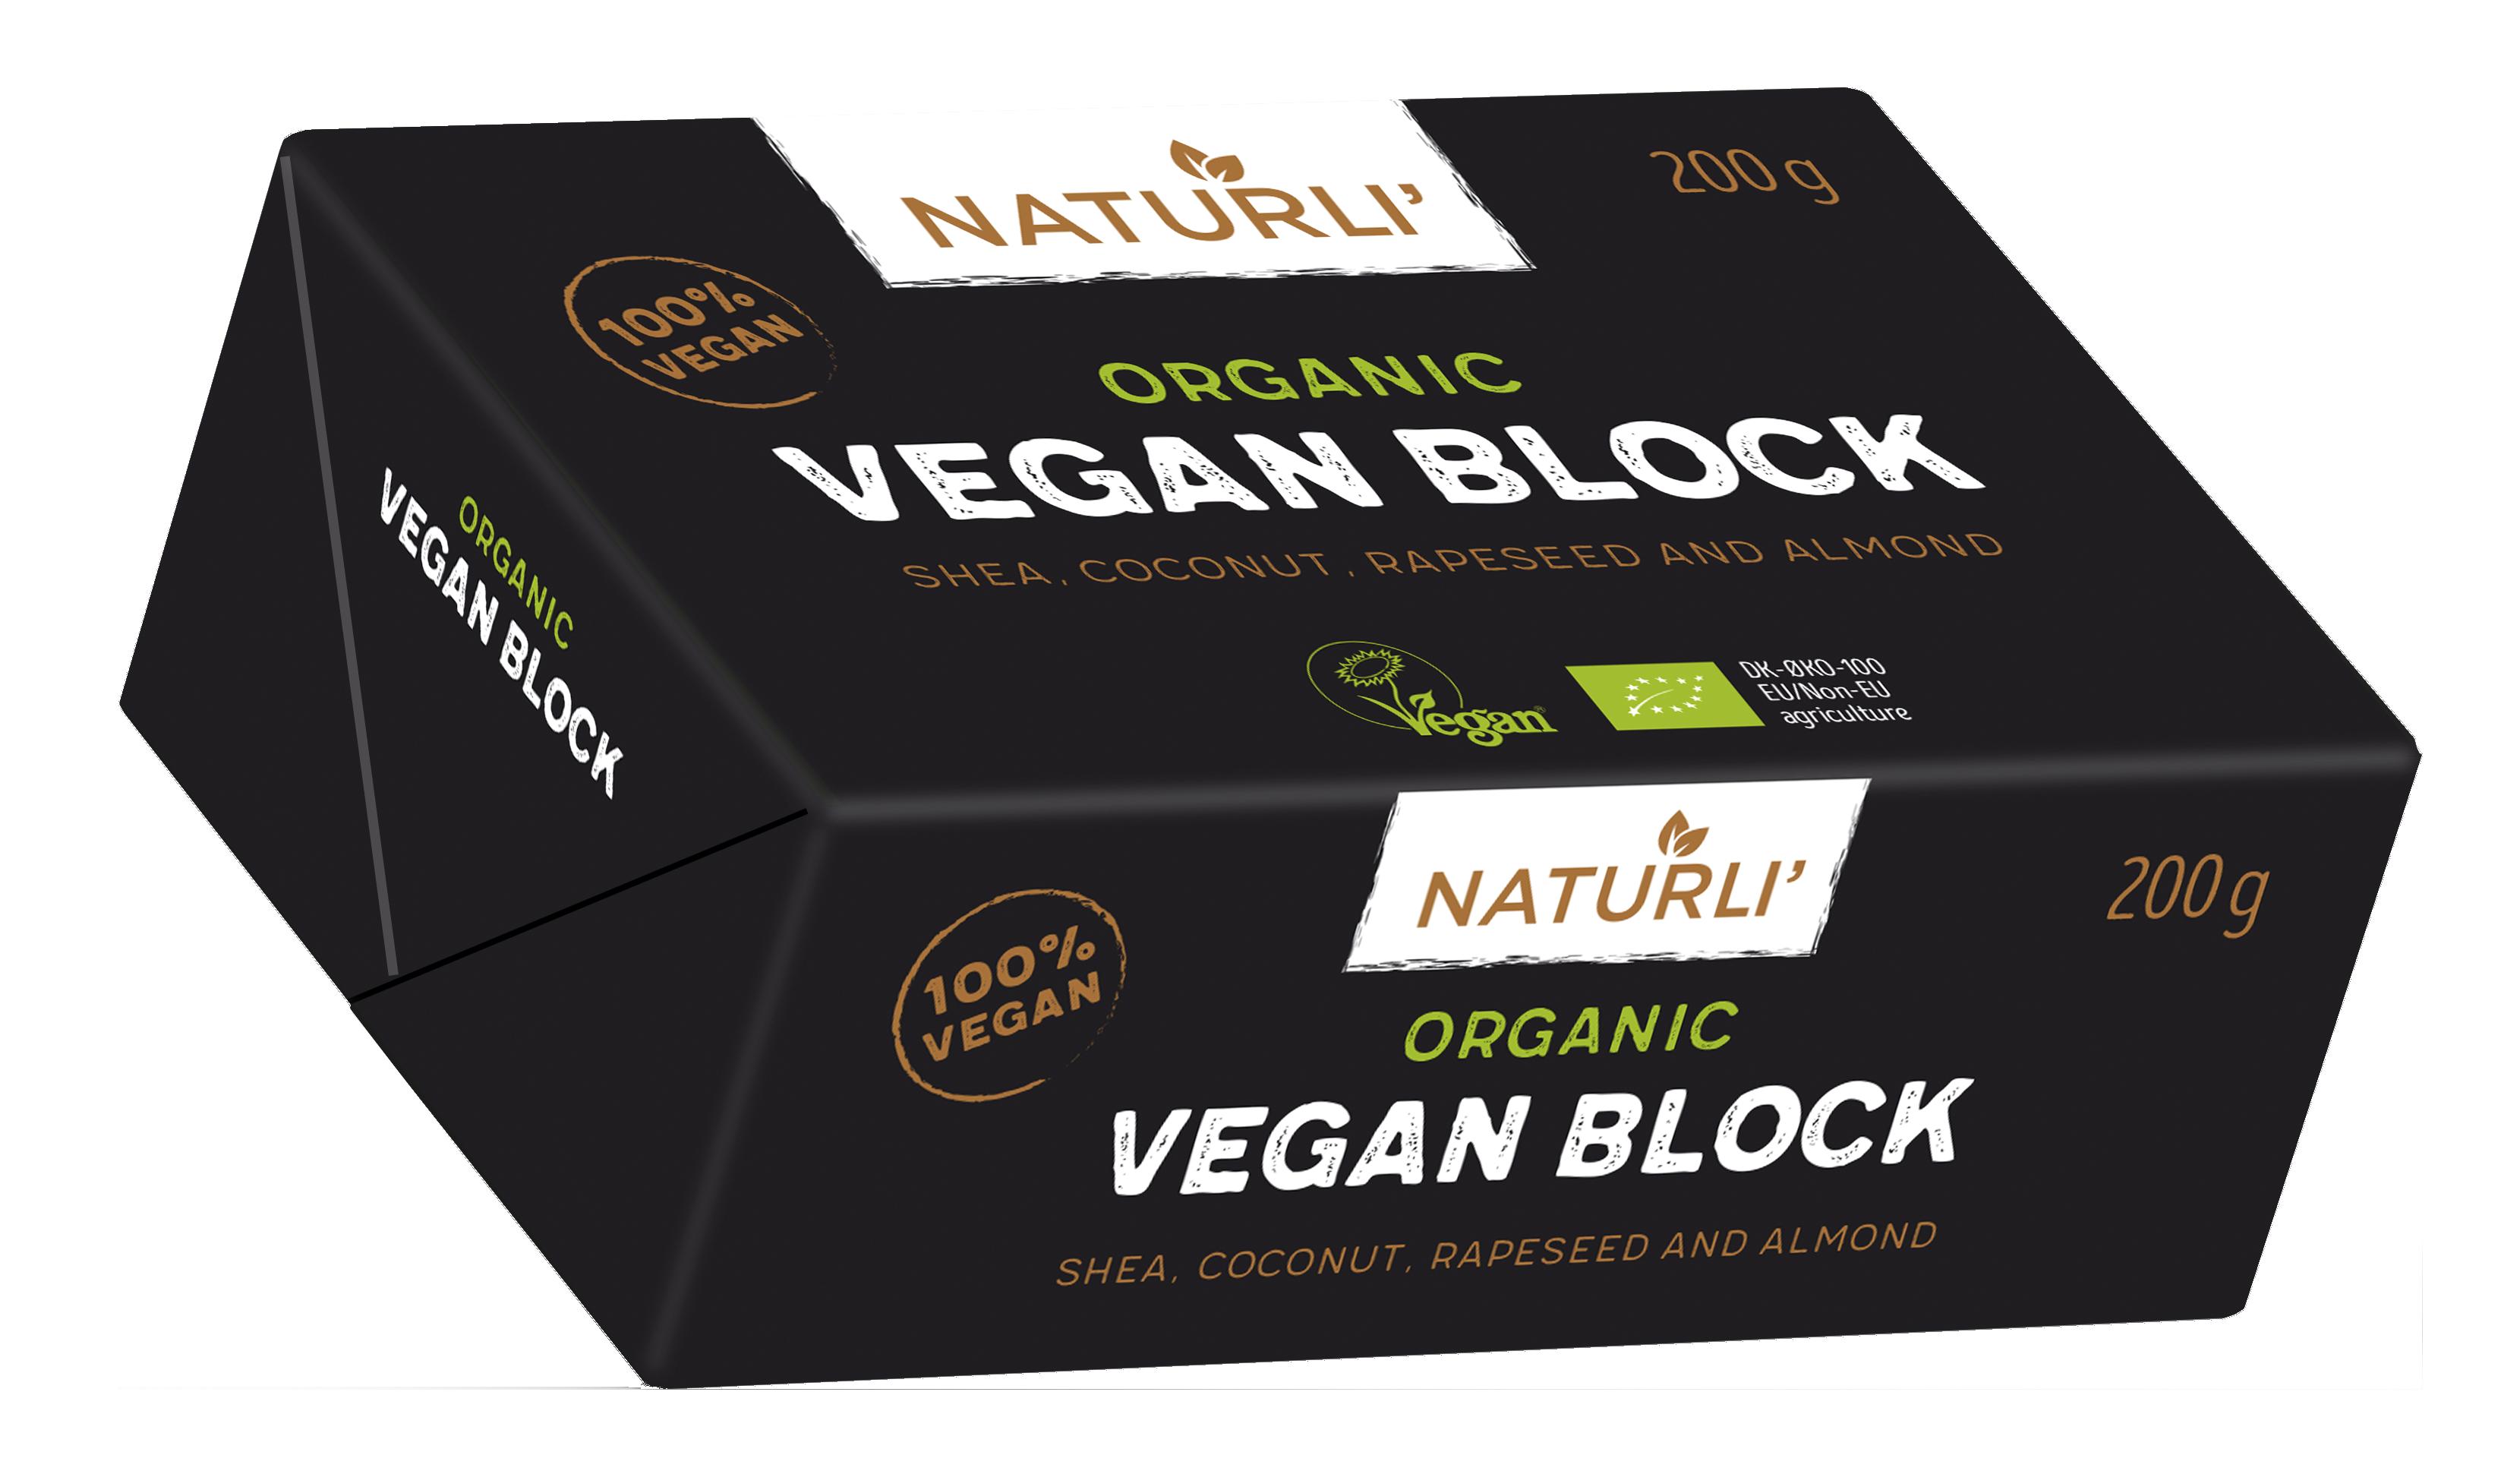 Naturli-vegan-block-200g_packshot_UK